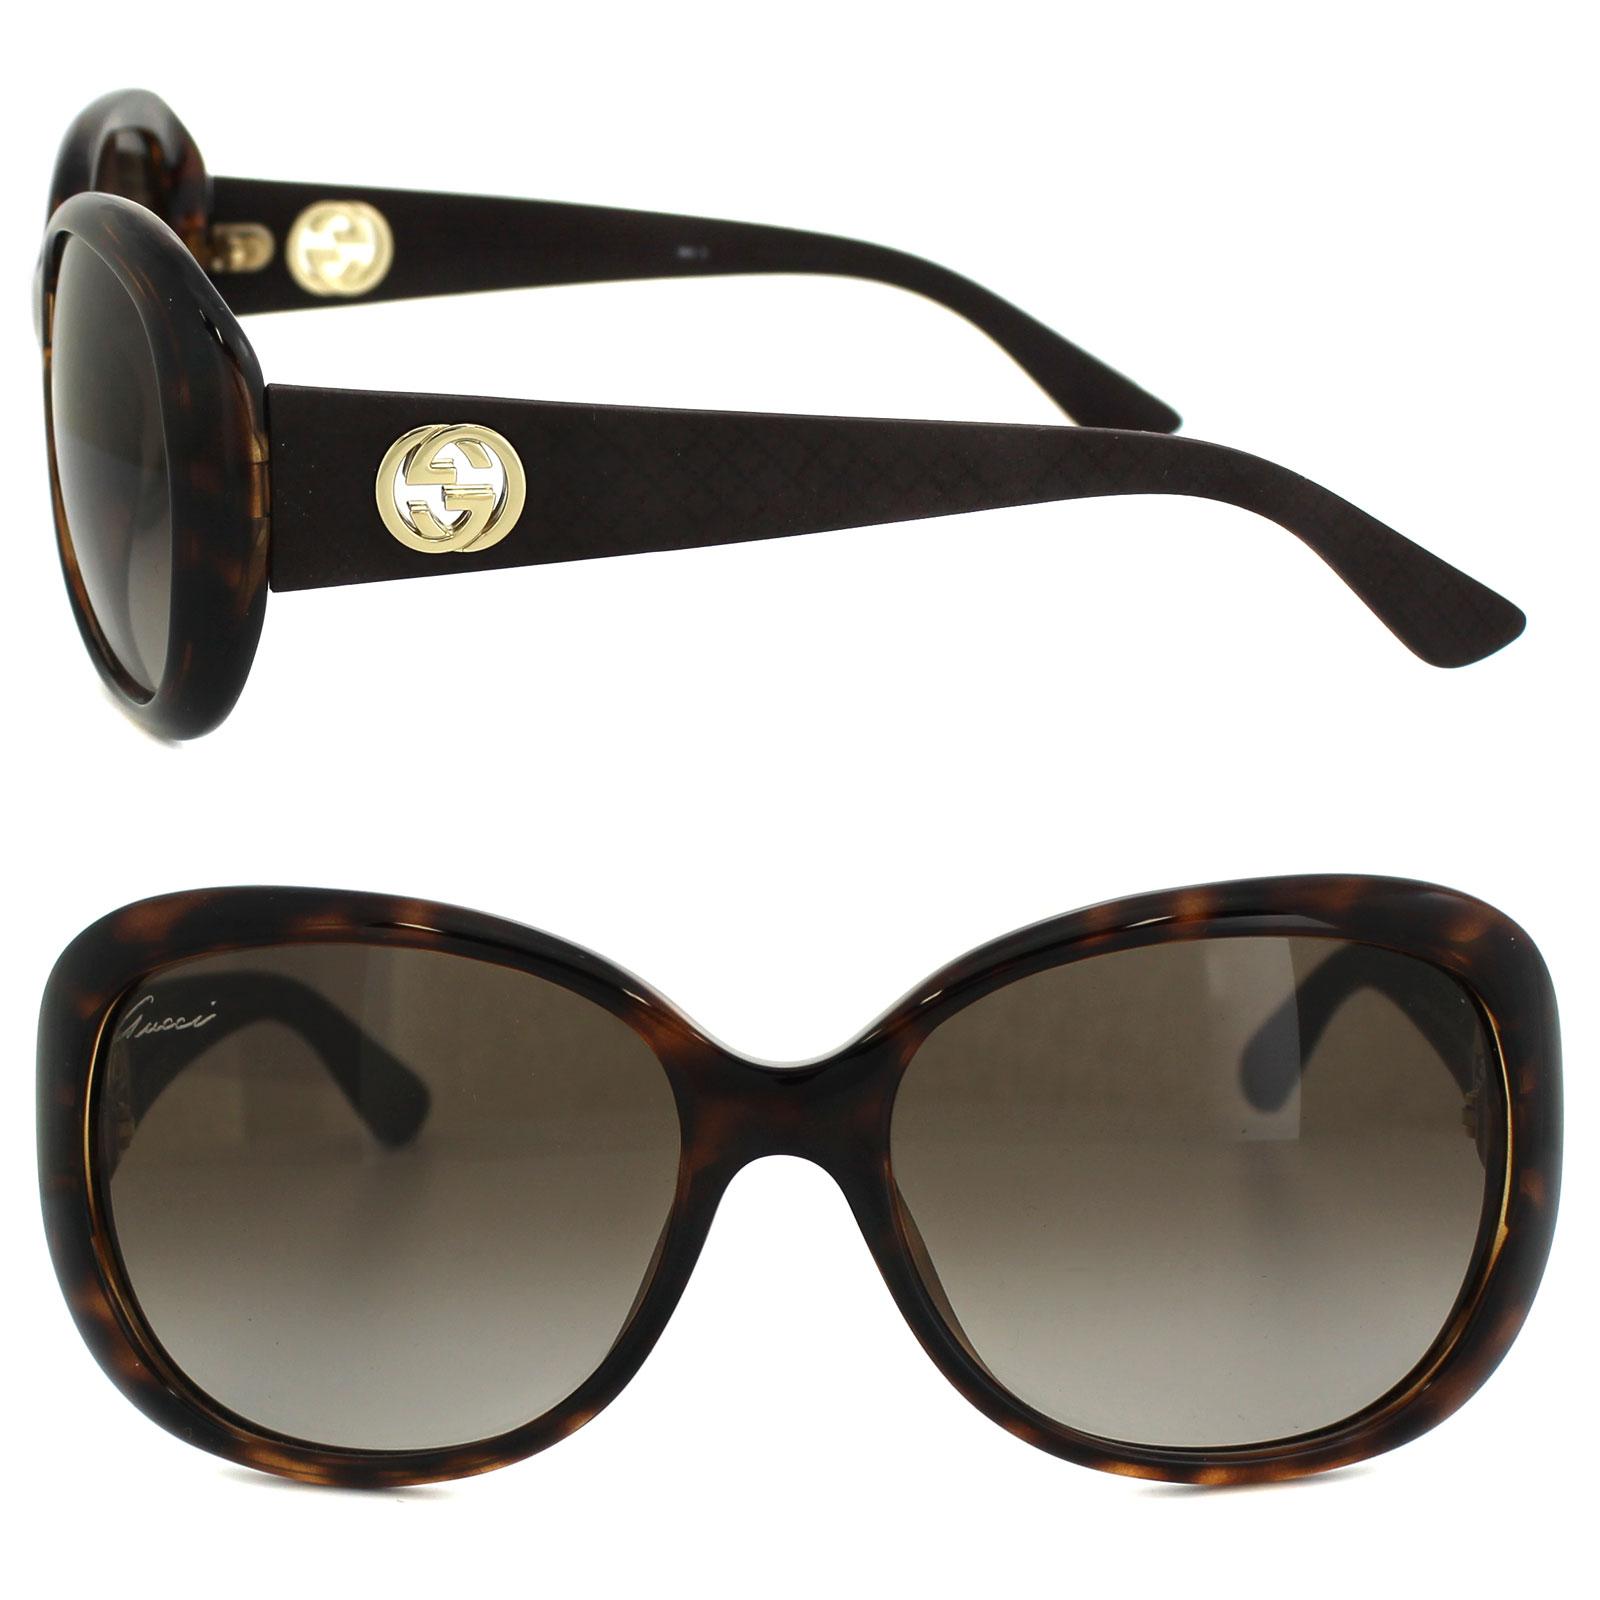 067dc78153c Gucci 3787 Sunglasses Thumbnail 1 Gucci 3787 Sunglasses Thumbnail 2 ...